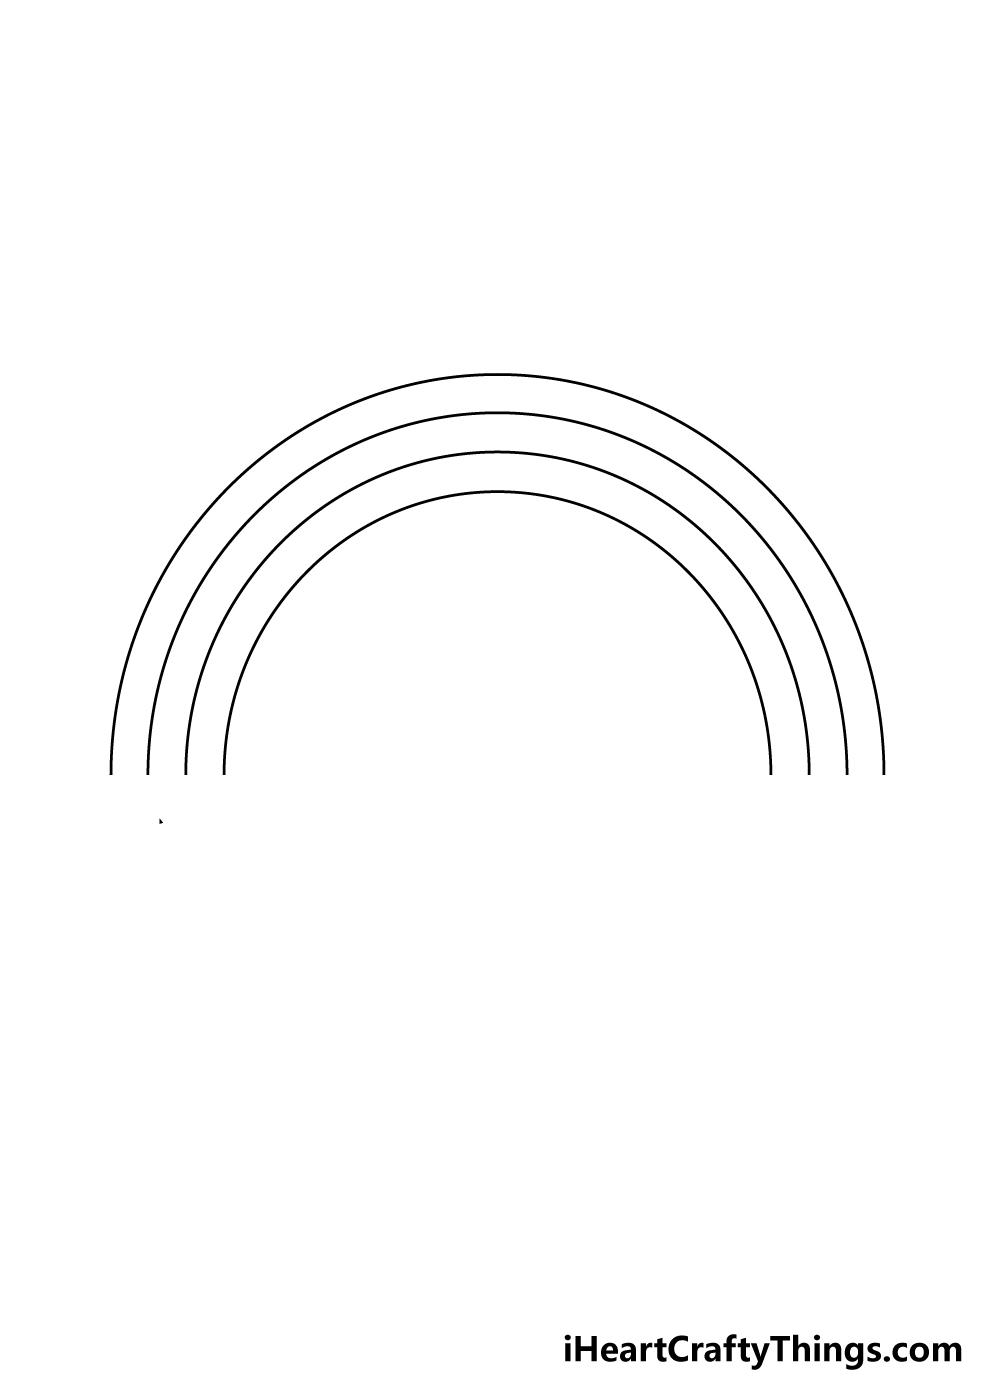 drawing a rainbow step 3